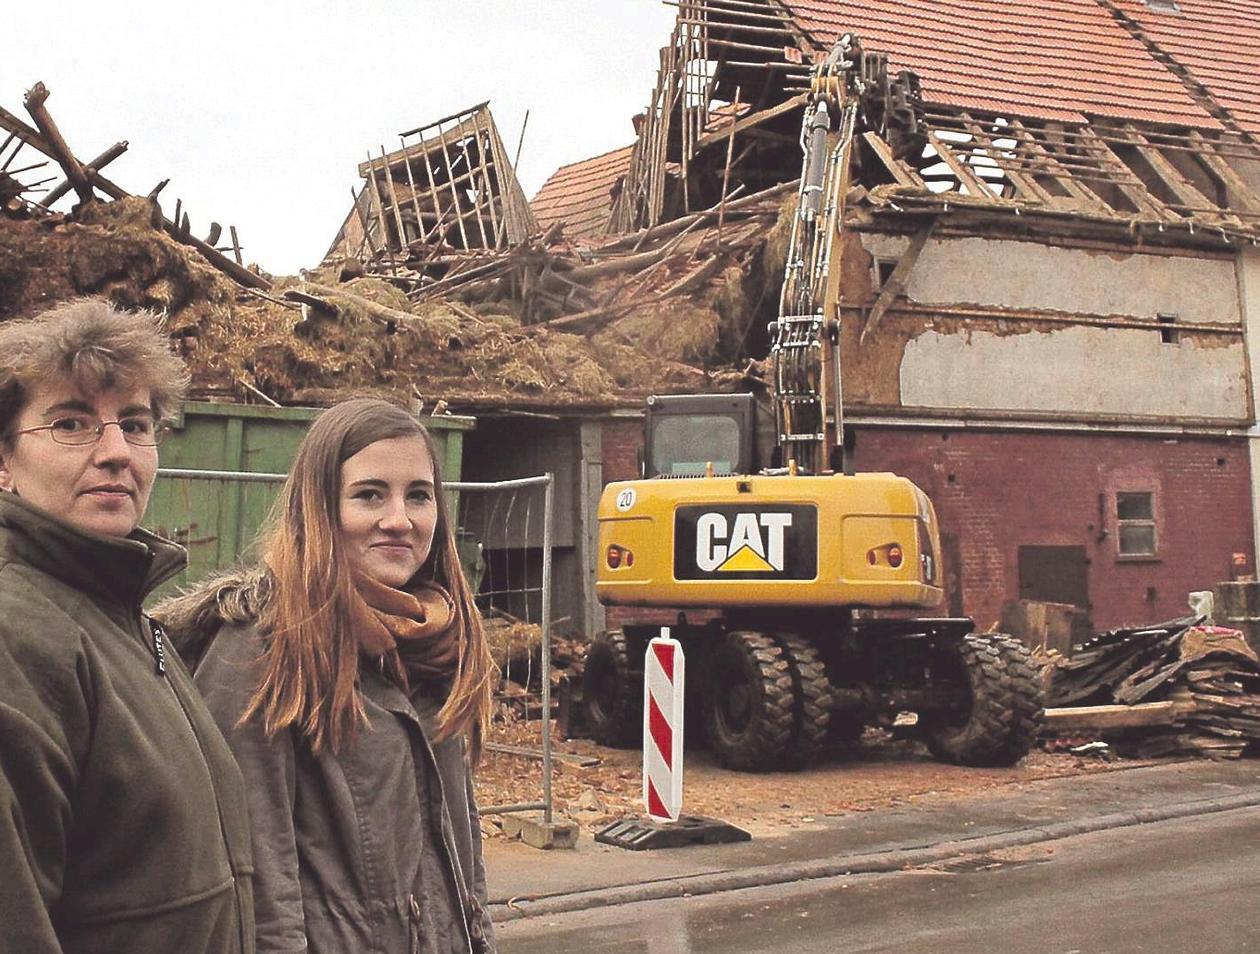 Favorit Abriss der alten Scheune in Oberelsungen war Omas letzter Wunsch OI87